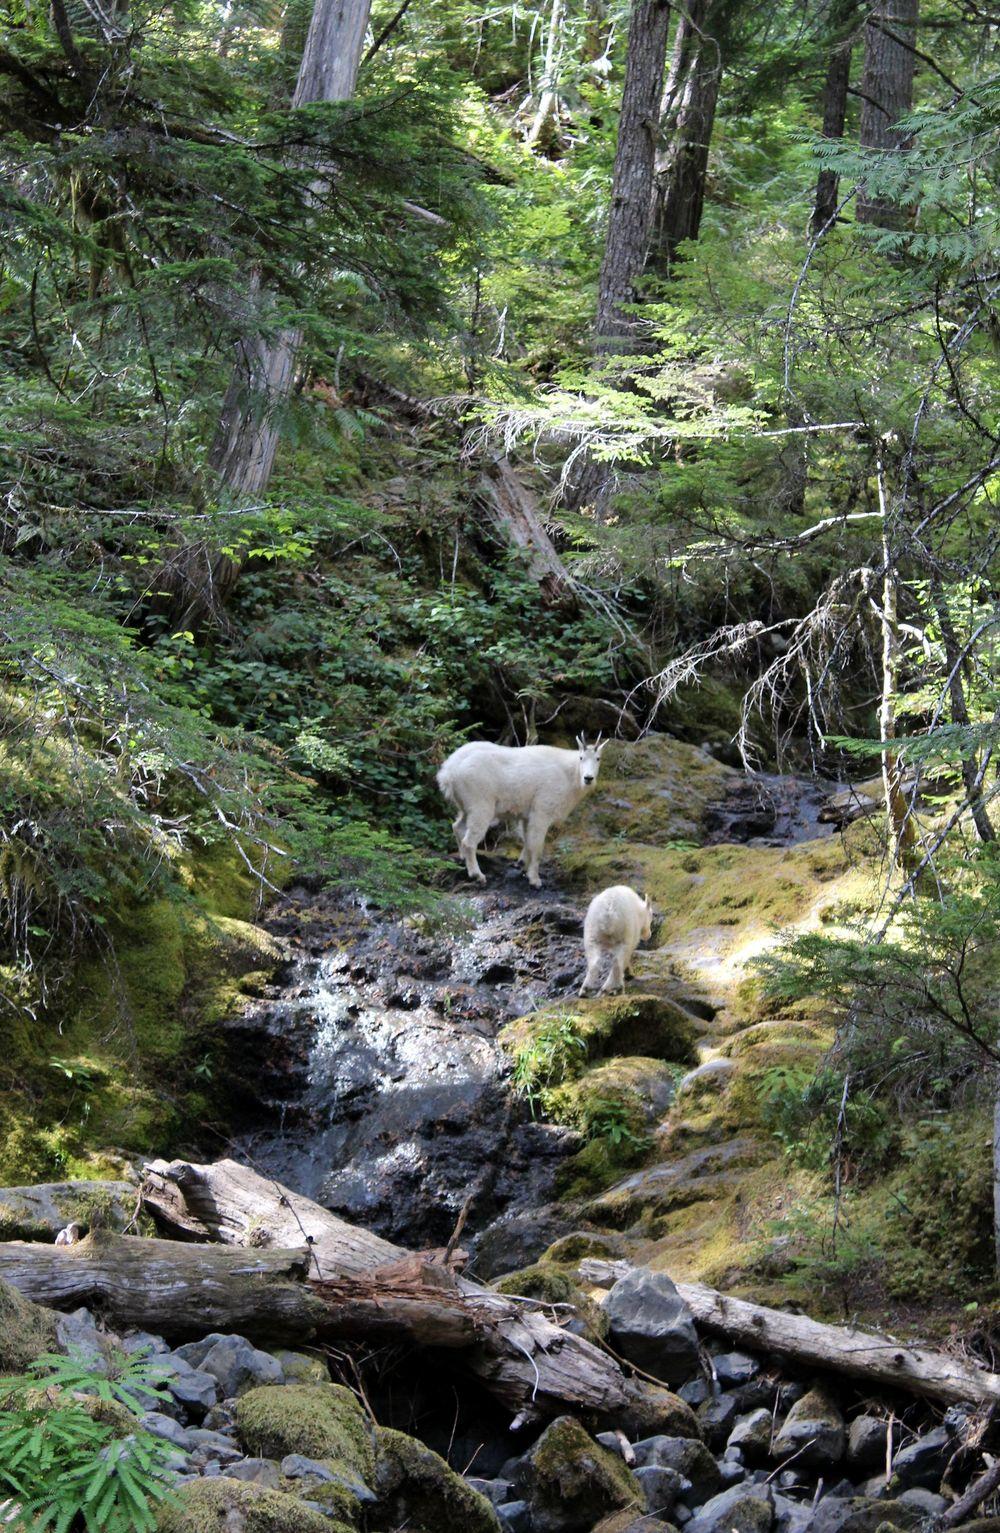 Chèvres des montagnes, Hamma Hamma, Jefferson County, Olympic National Park, WA, USA